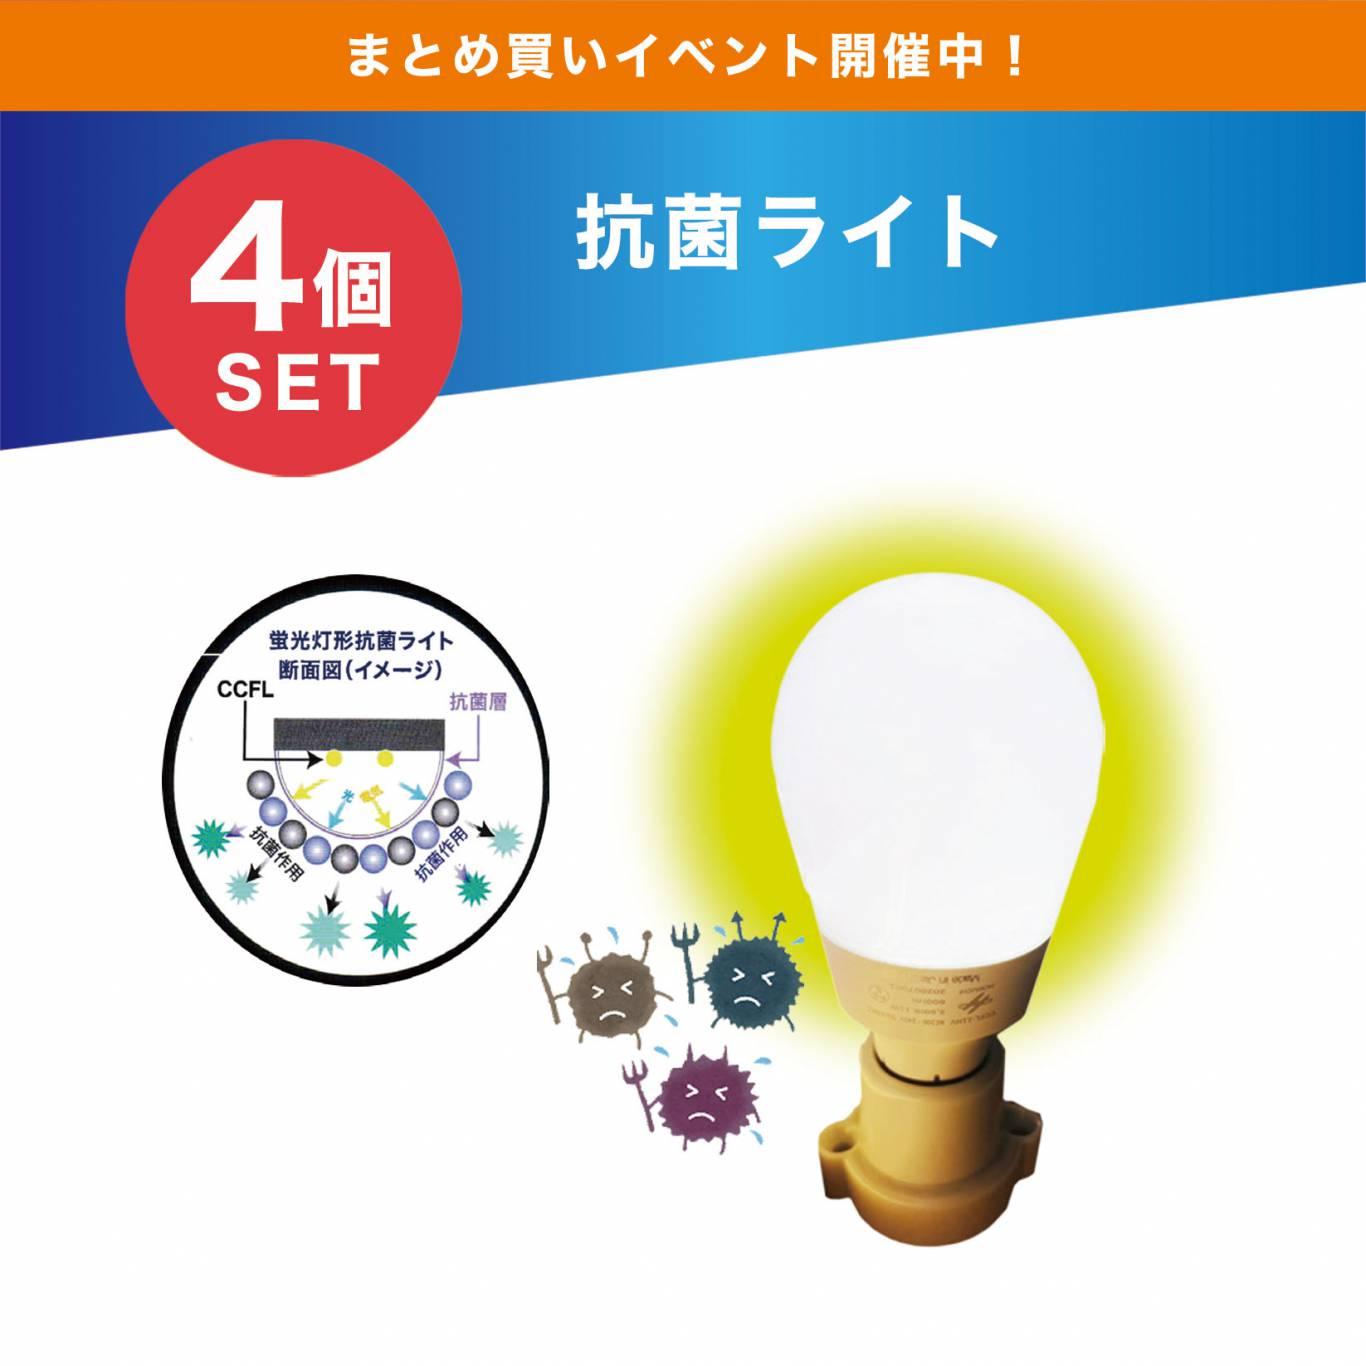 【EVENT】安心生活! CCFL抗菌ライト 4個まとめ買い(40,000円⇒32,000円 8,000円お得!激安)